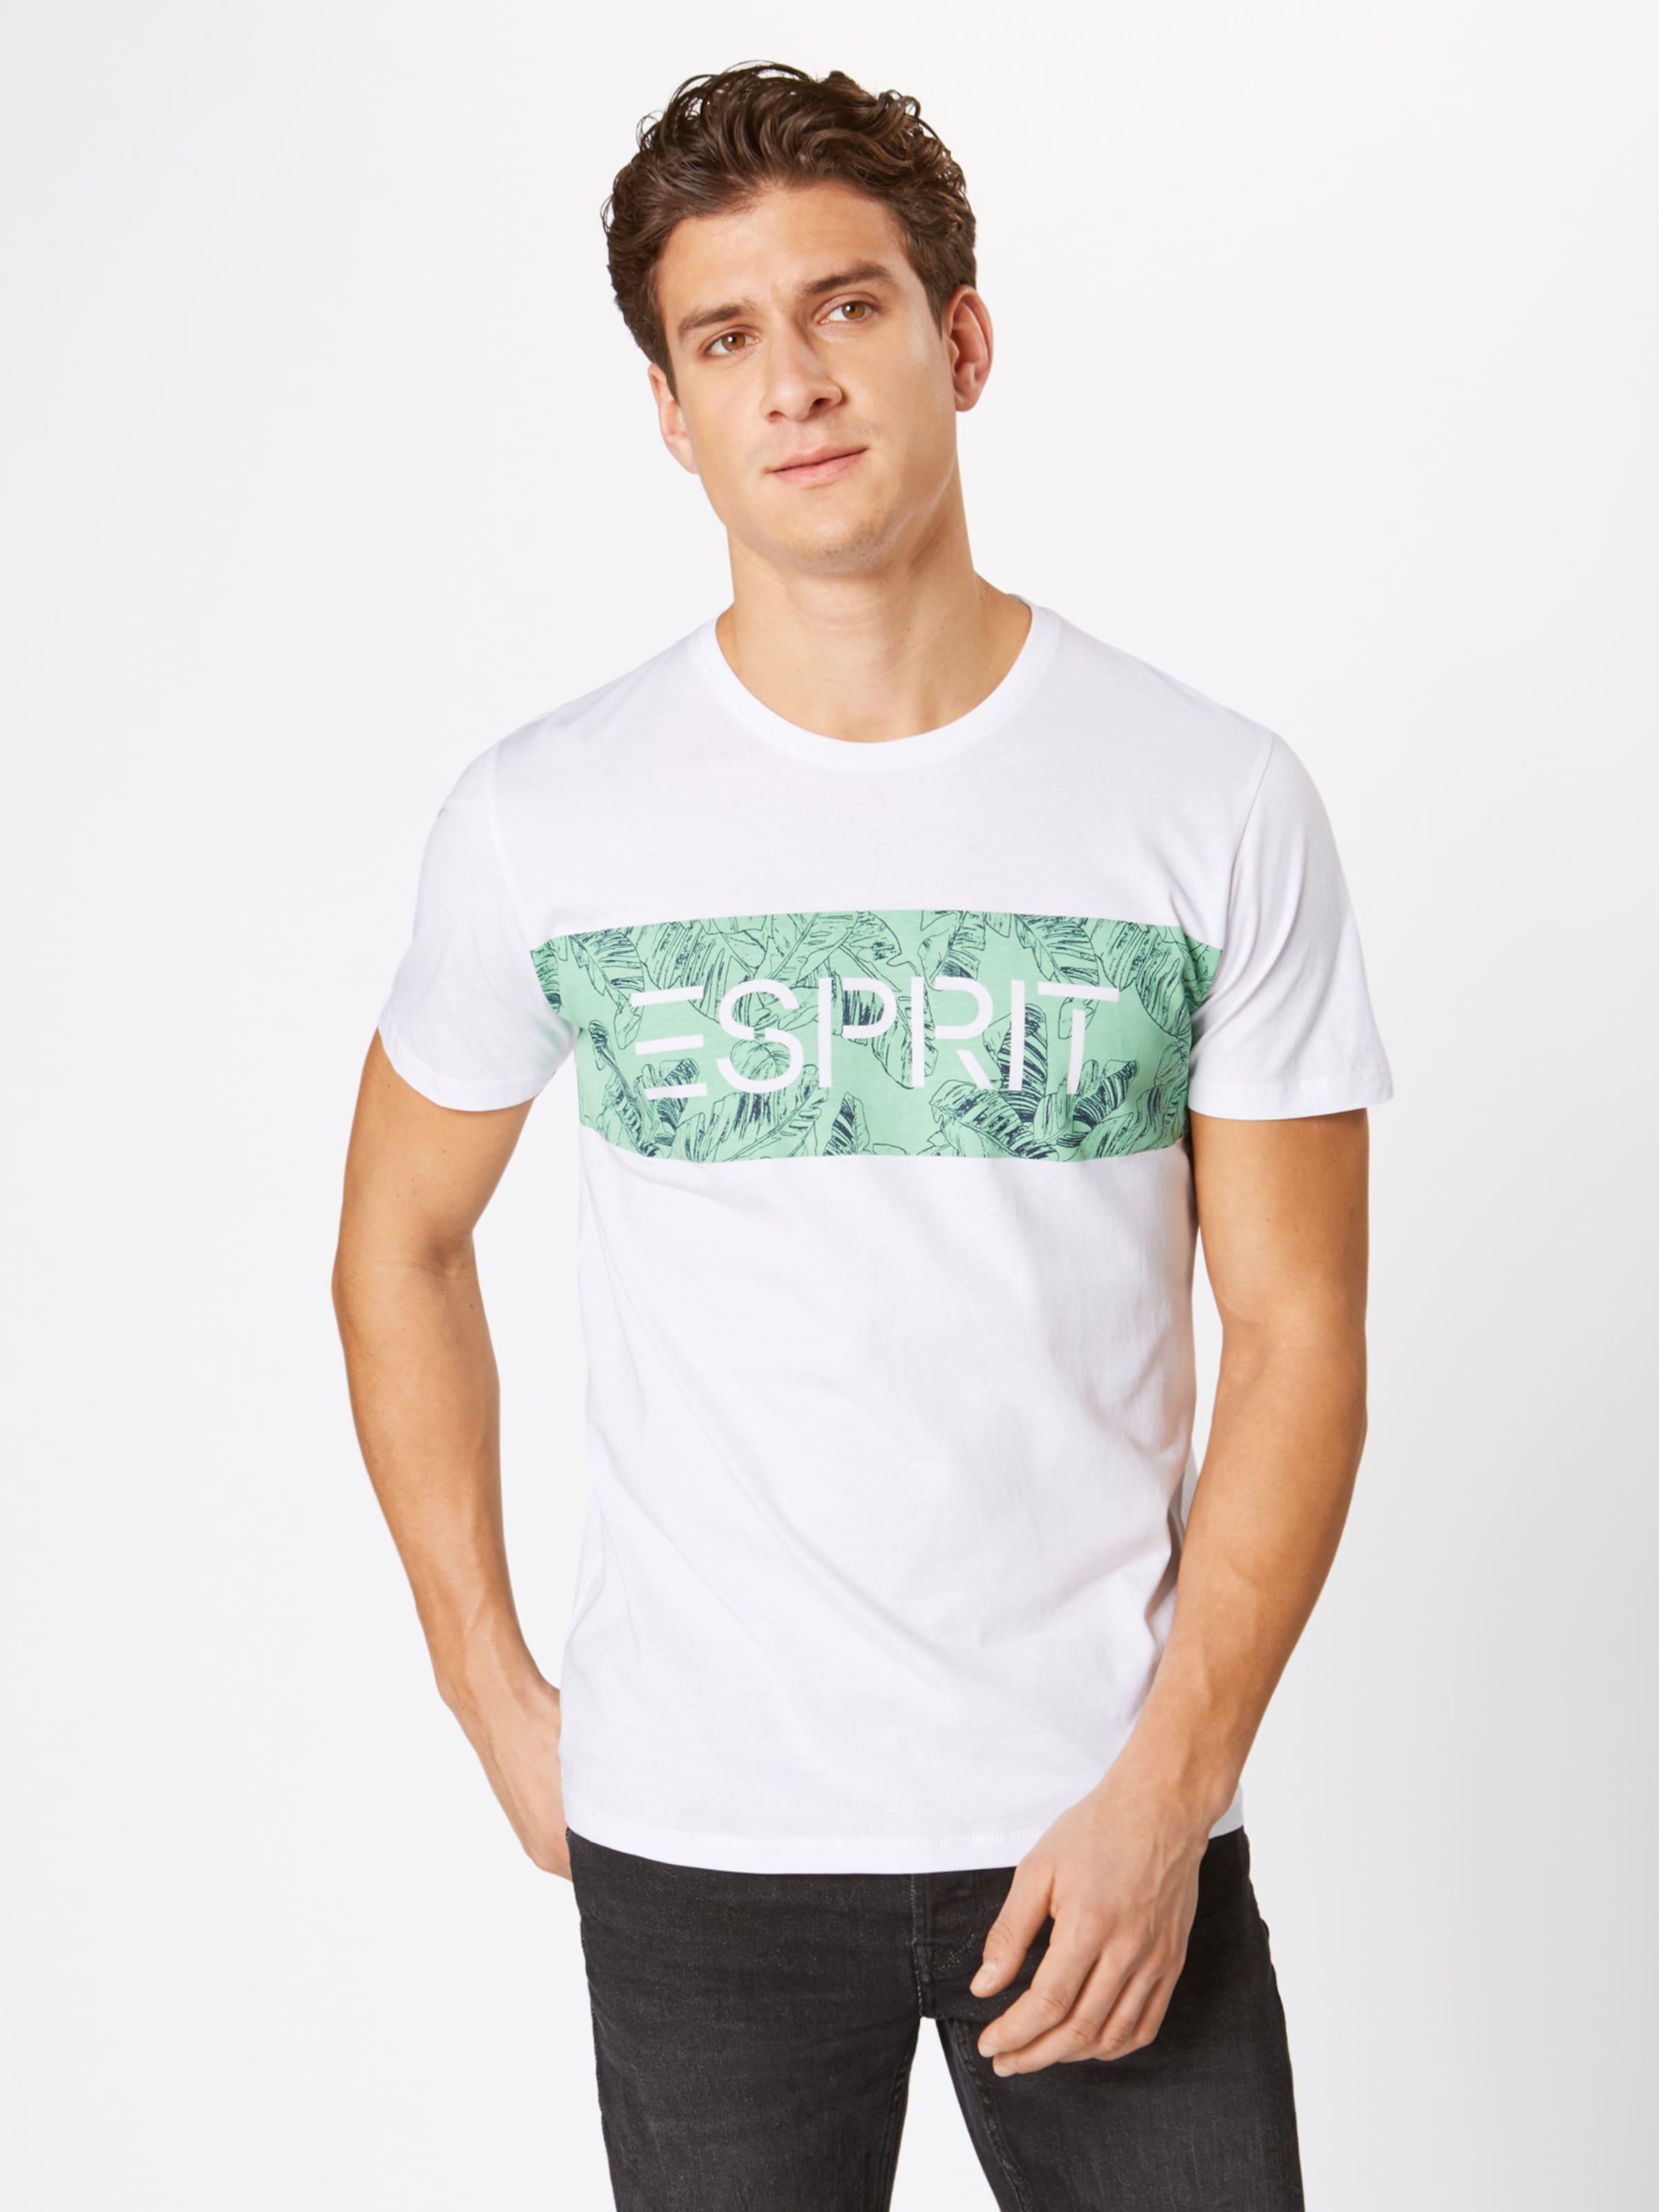 Blanc shirt Esprit T shirt En En Esprit Esprit T shirt En T Blanc eWIDYEHb29